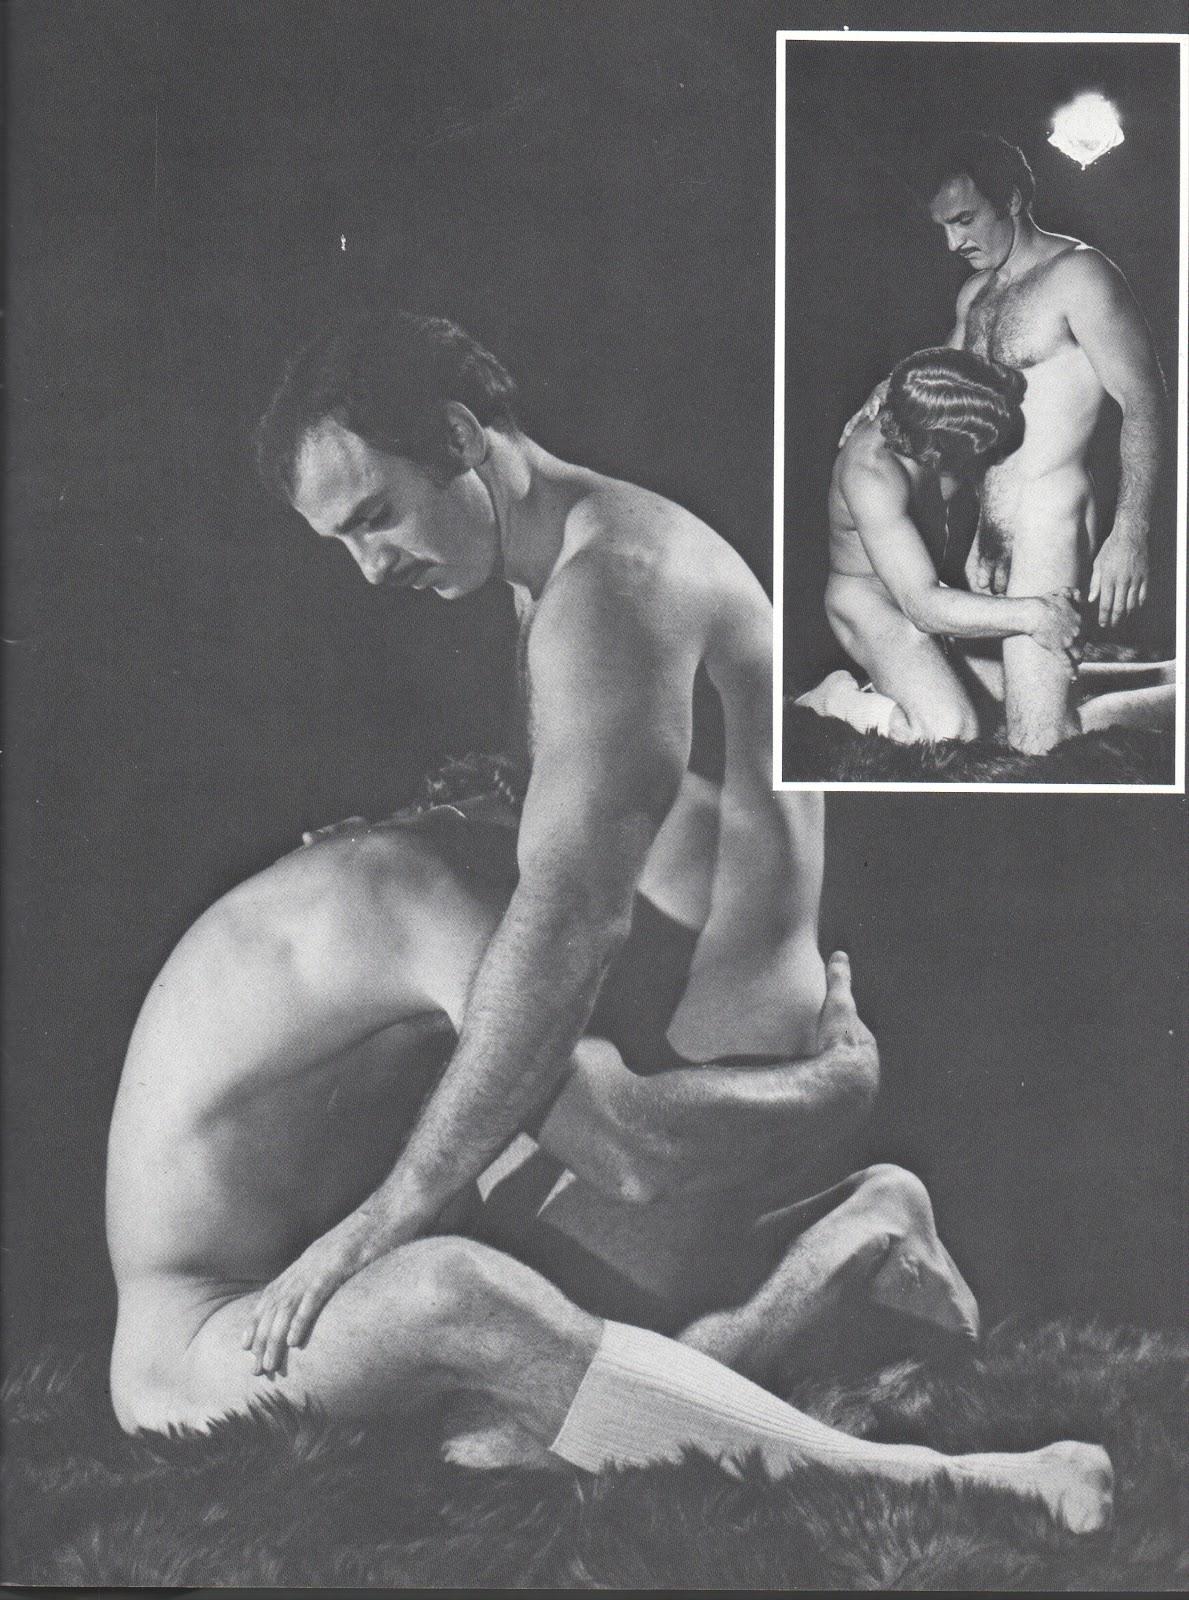 Paul Barresi bareback fuck Lee Marlin vintage gay hot daddy dude men porn